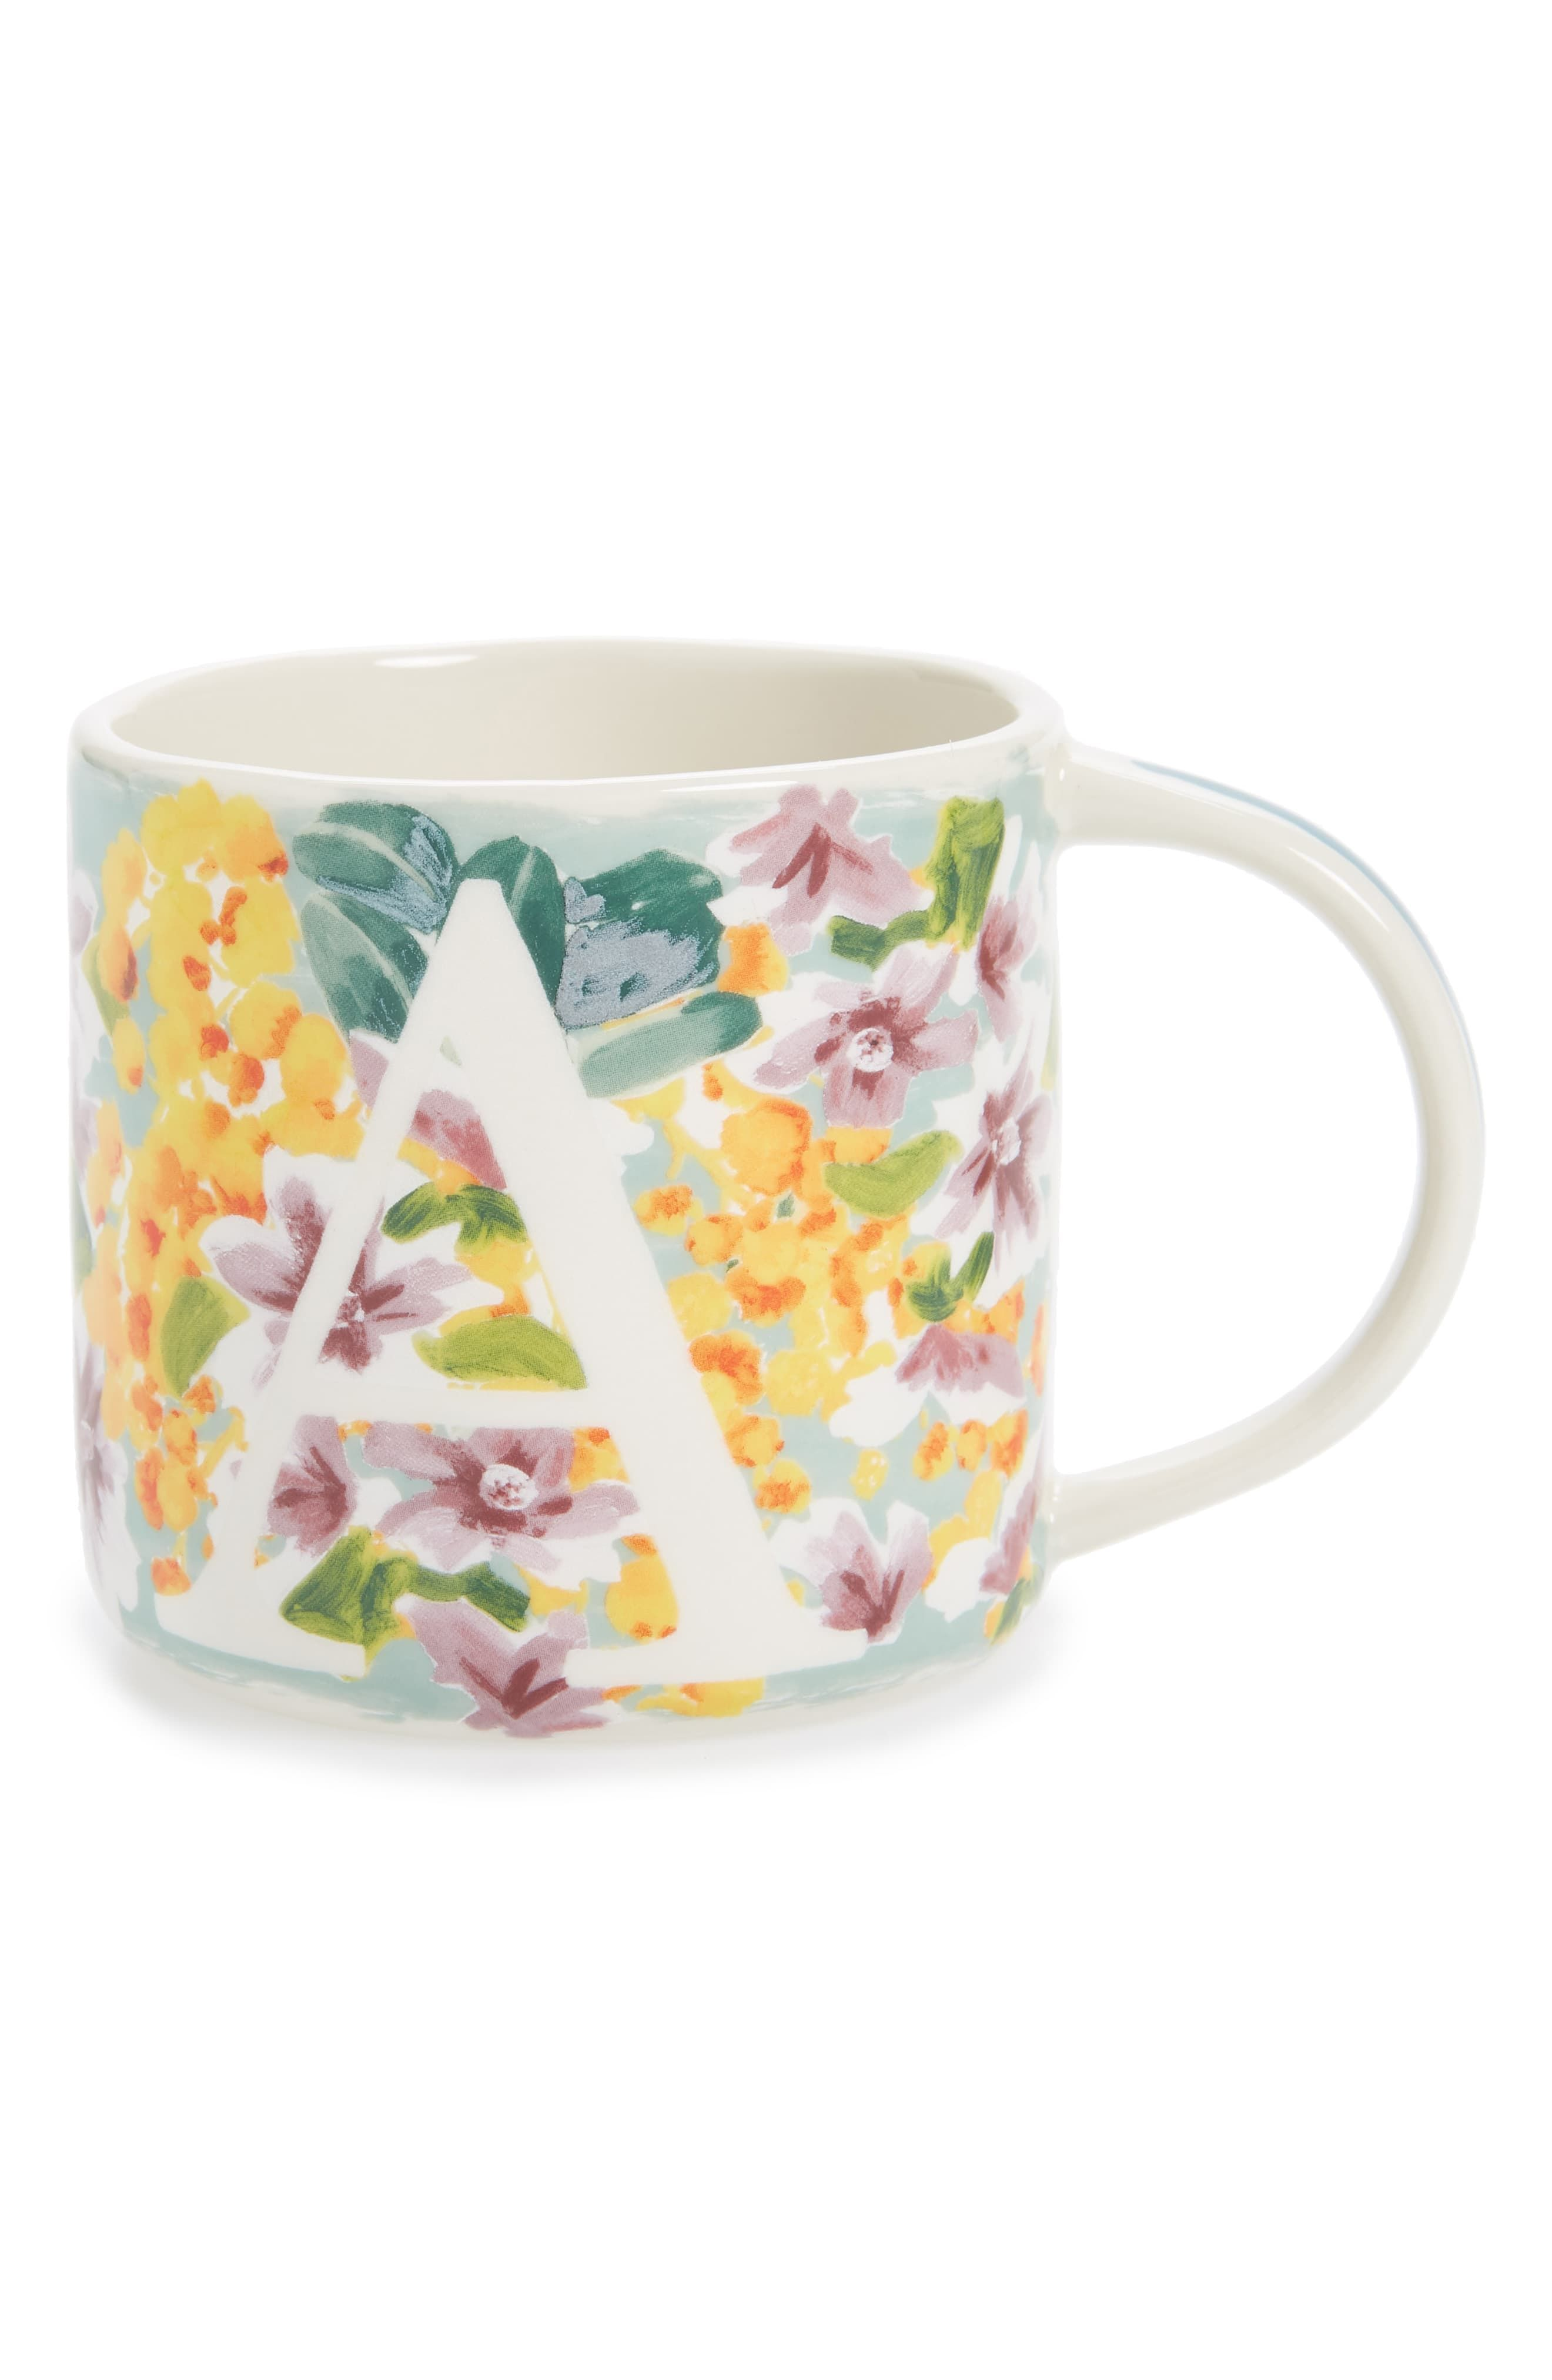 Anthropologie Home Dawn Monogram Mug Size One Size White In 2020 Anthropologie Mugs Mugs Monogram Coffee Mug